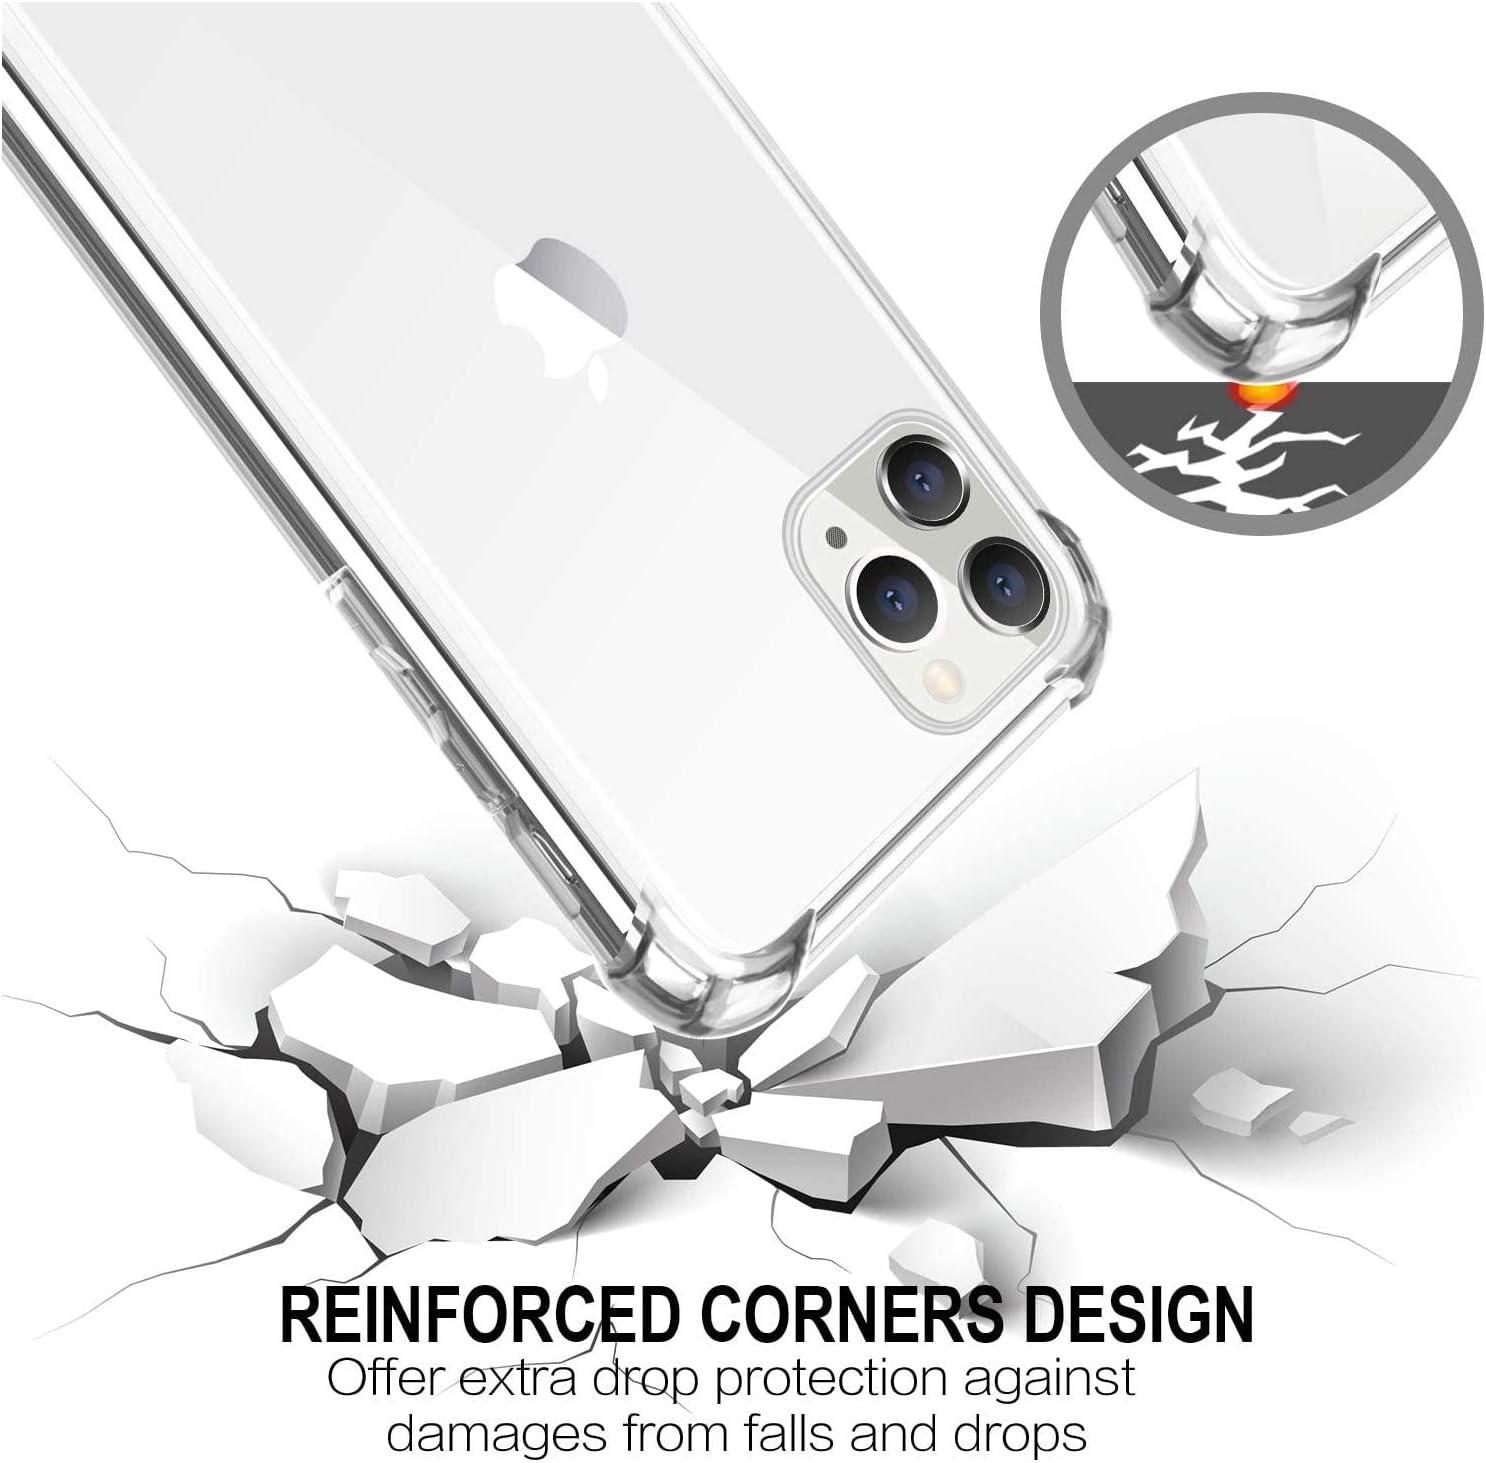 Esquinas Reforzadas Anti-Choques Anti Ara/ñazos protecci/ón Case para iPhone 11 Pro MAX 6.5 Carcasa Transparente TPU Suave Silicona Case PC Panel Trasero Funda Compatible con iPhone 11 Pro MAX